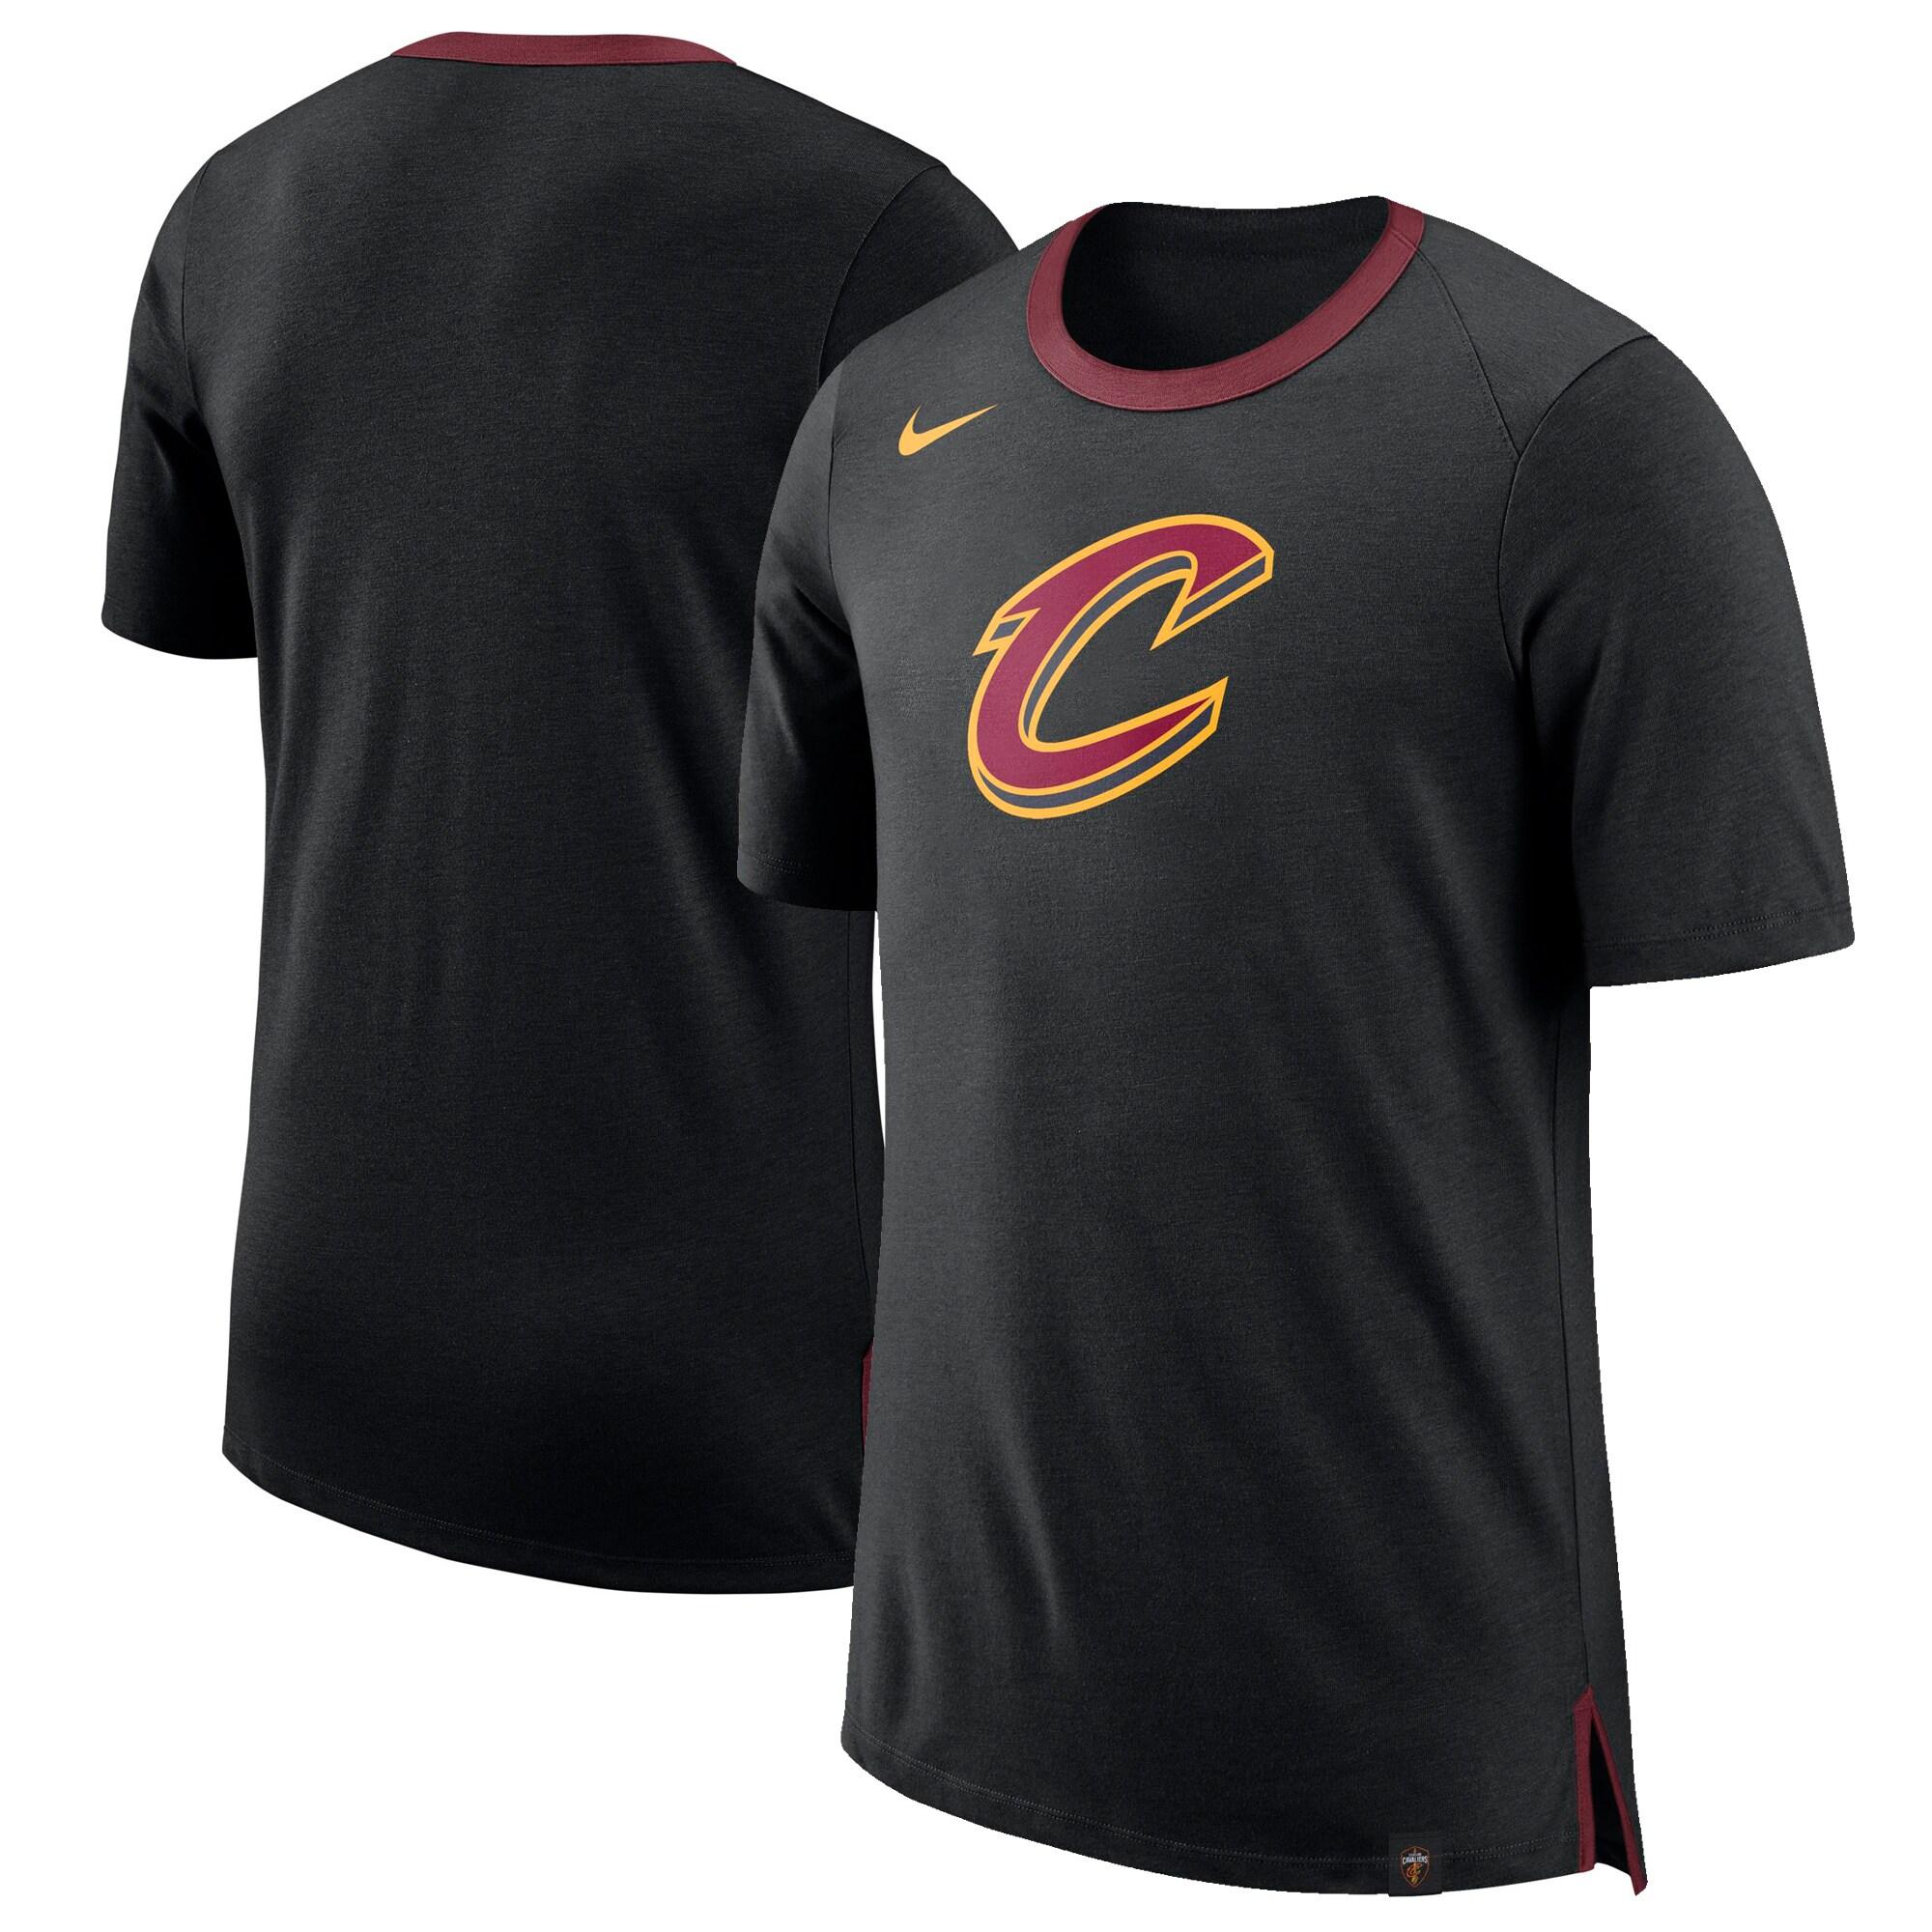 Cleveland Cavaliers Nike Basketball Fan T-Shirt - Black